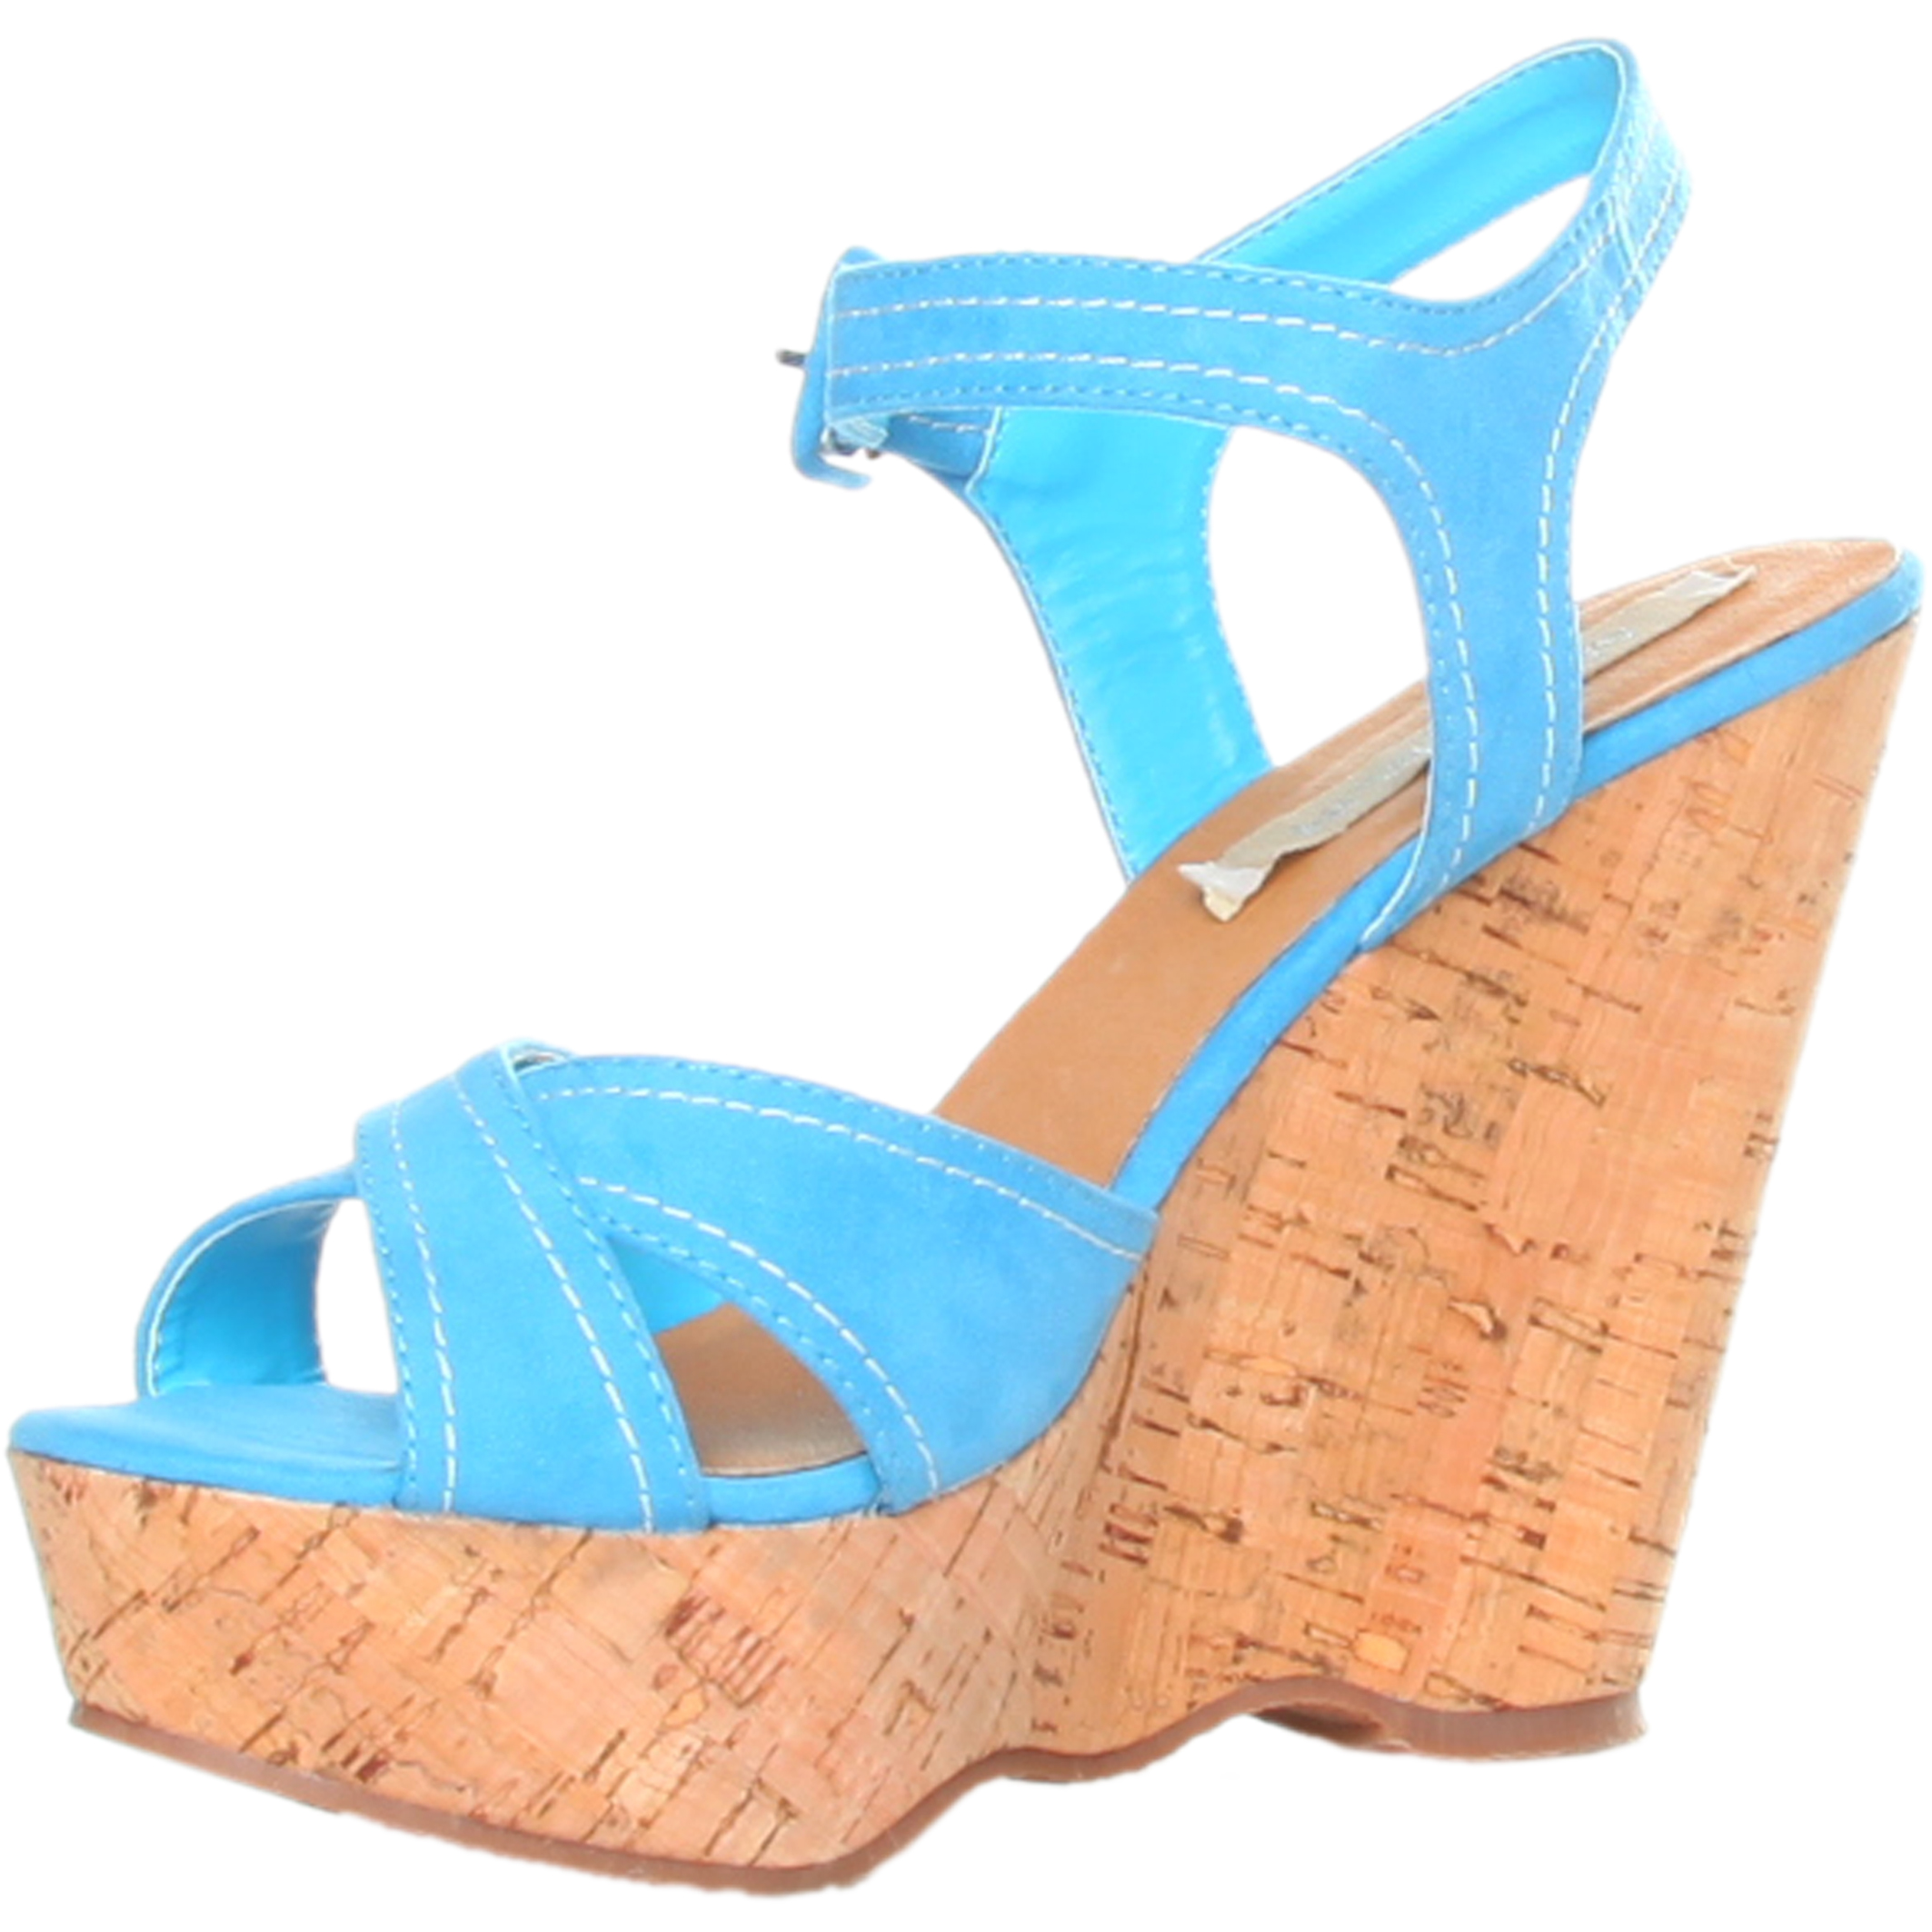 Ana Lublin Sandals Lblu Rf600349